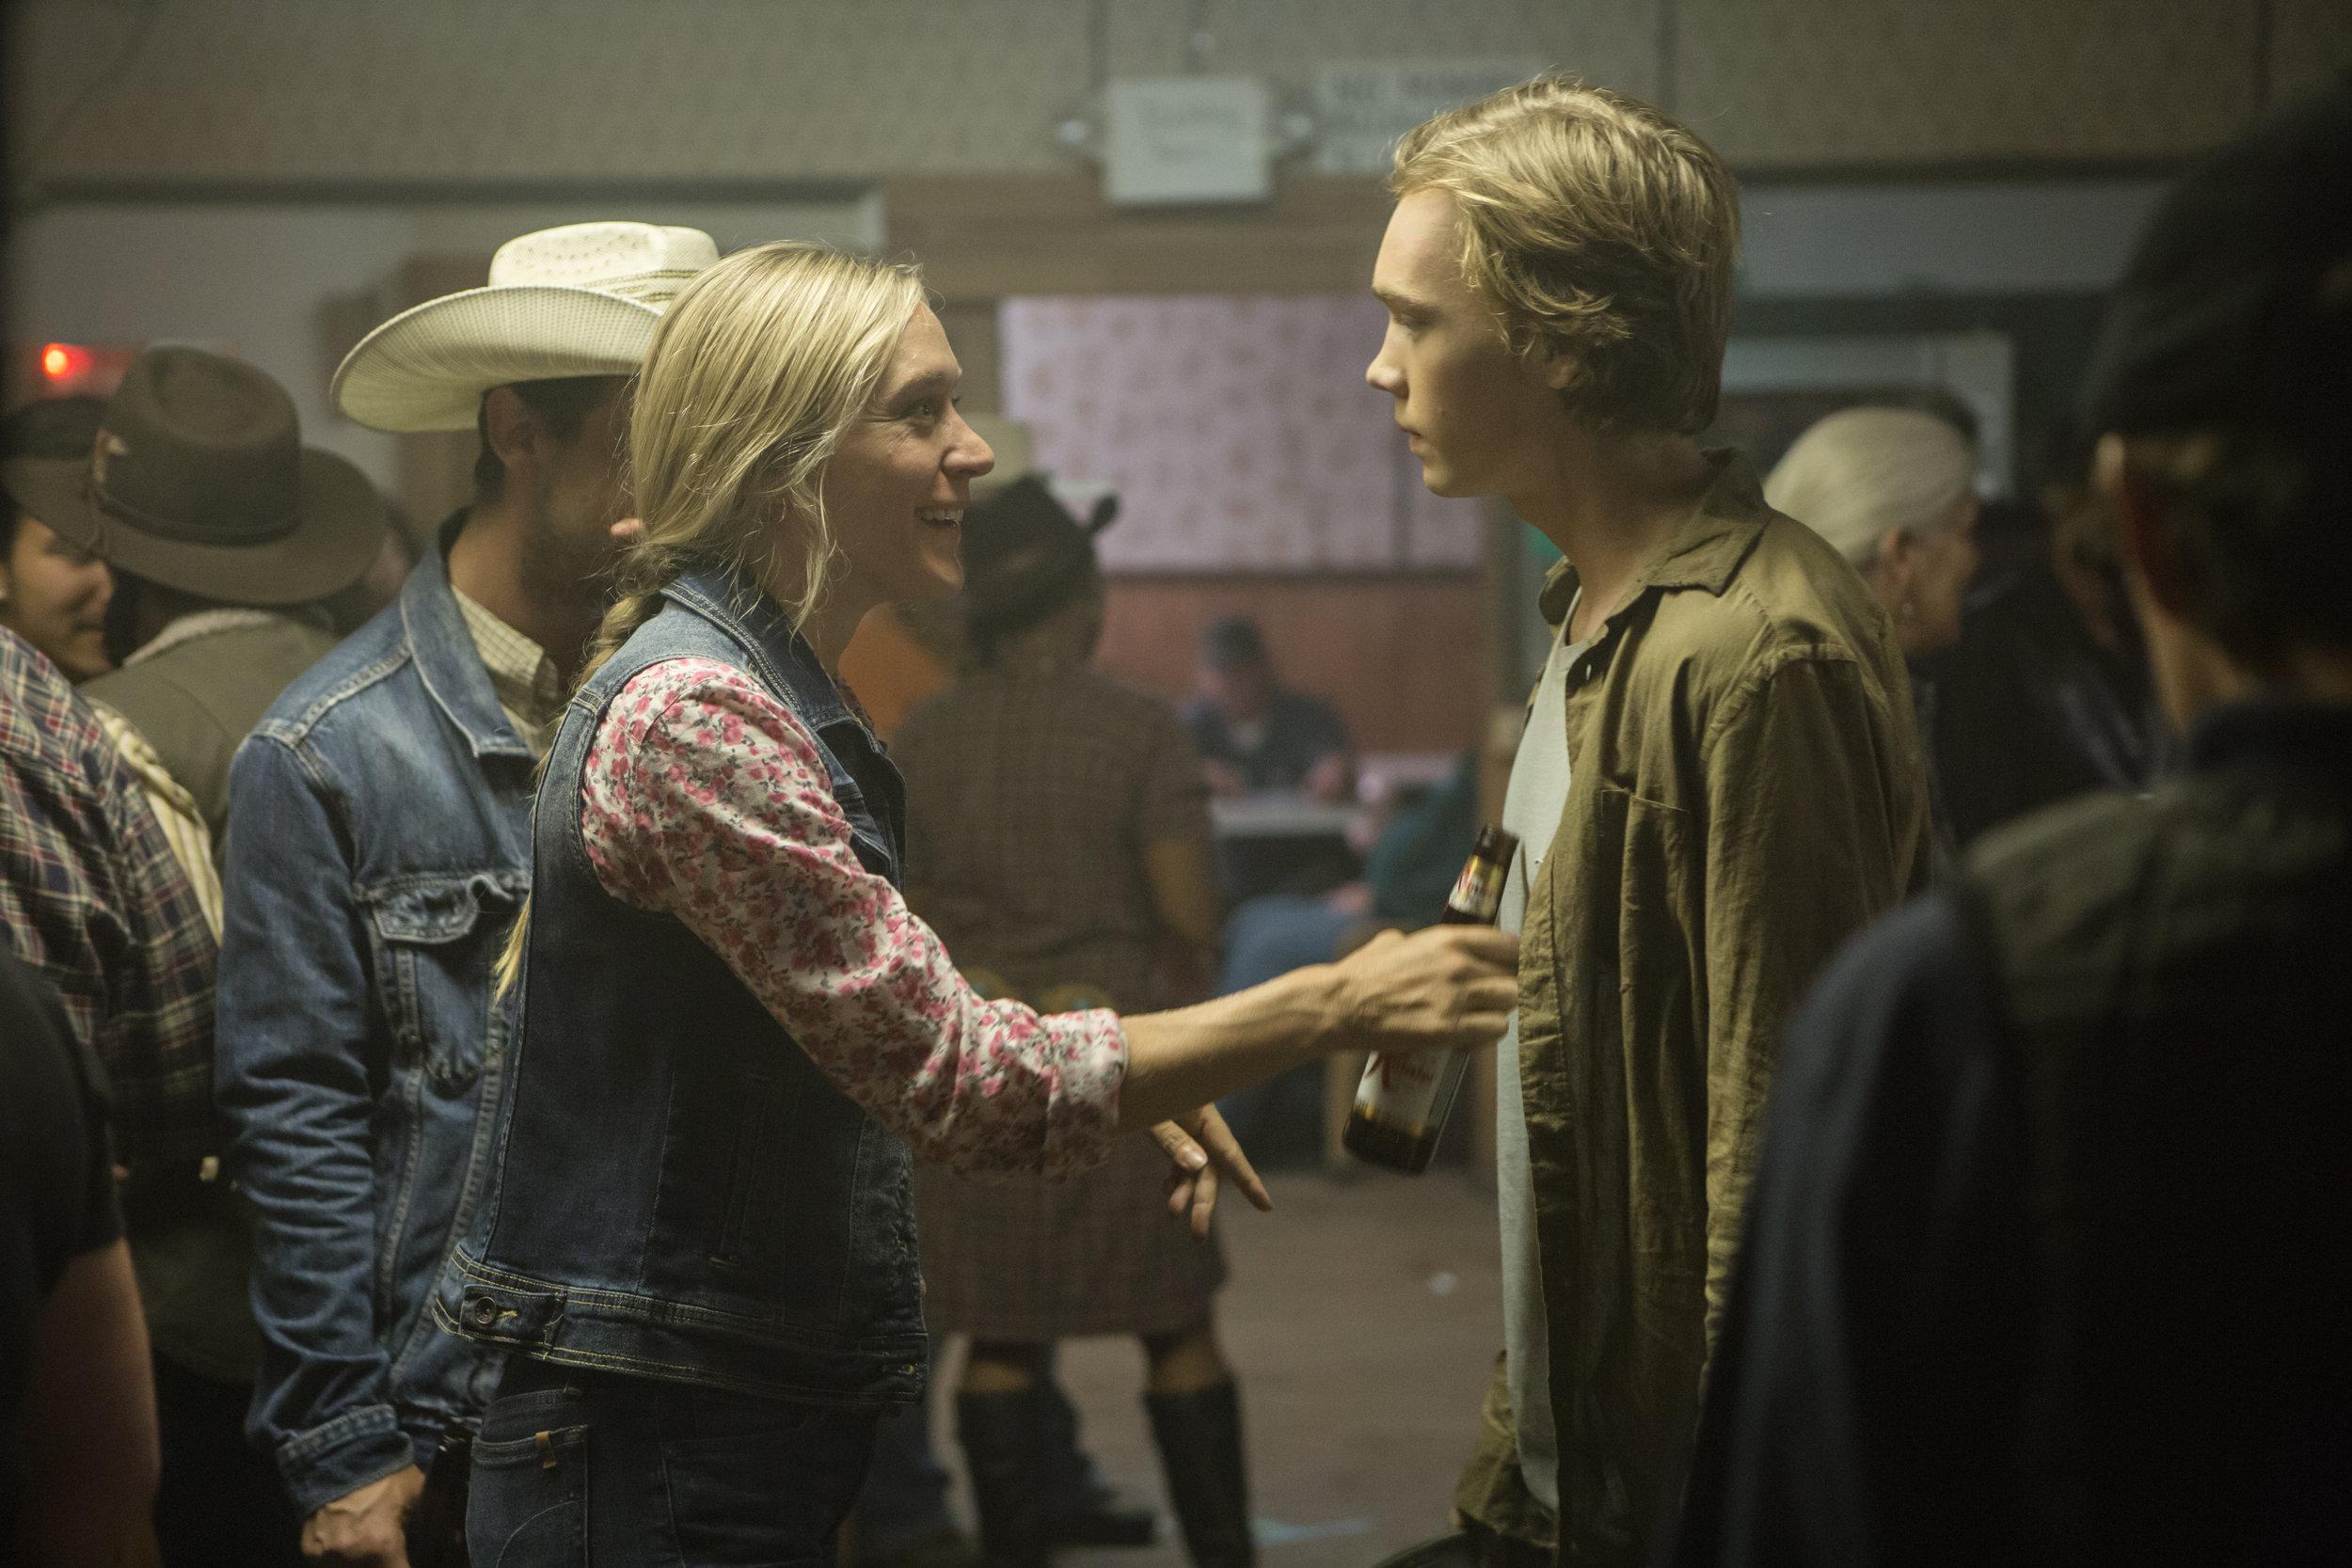 Chloe Sevigny is a veteran jockey named Bonnie. Charlie Plummer is Charley, who loves his horse